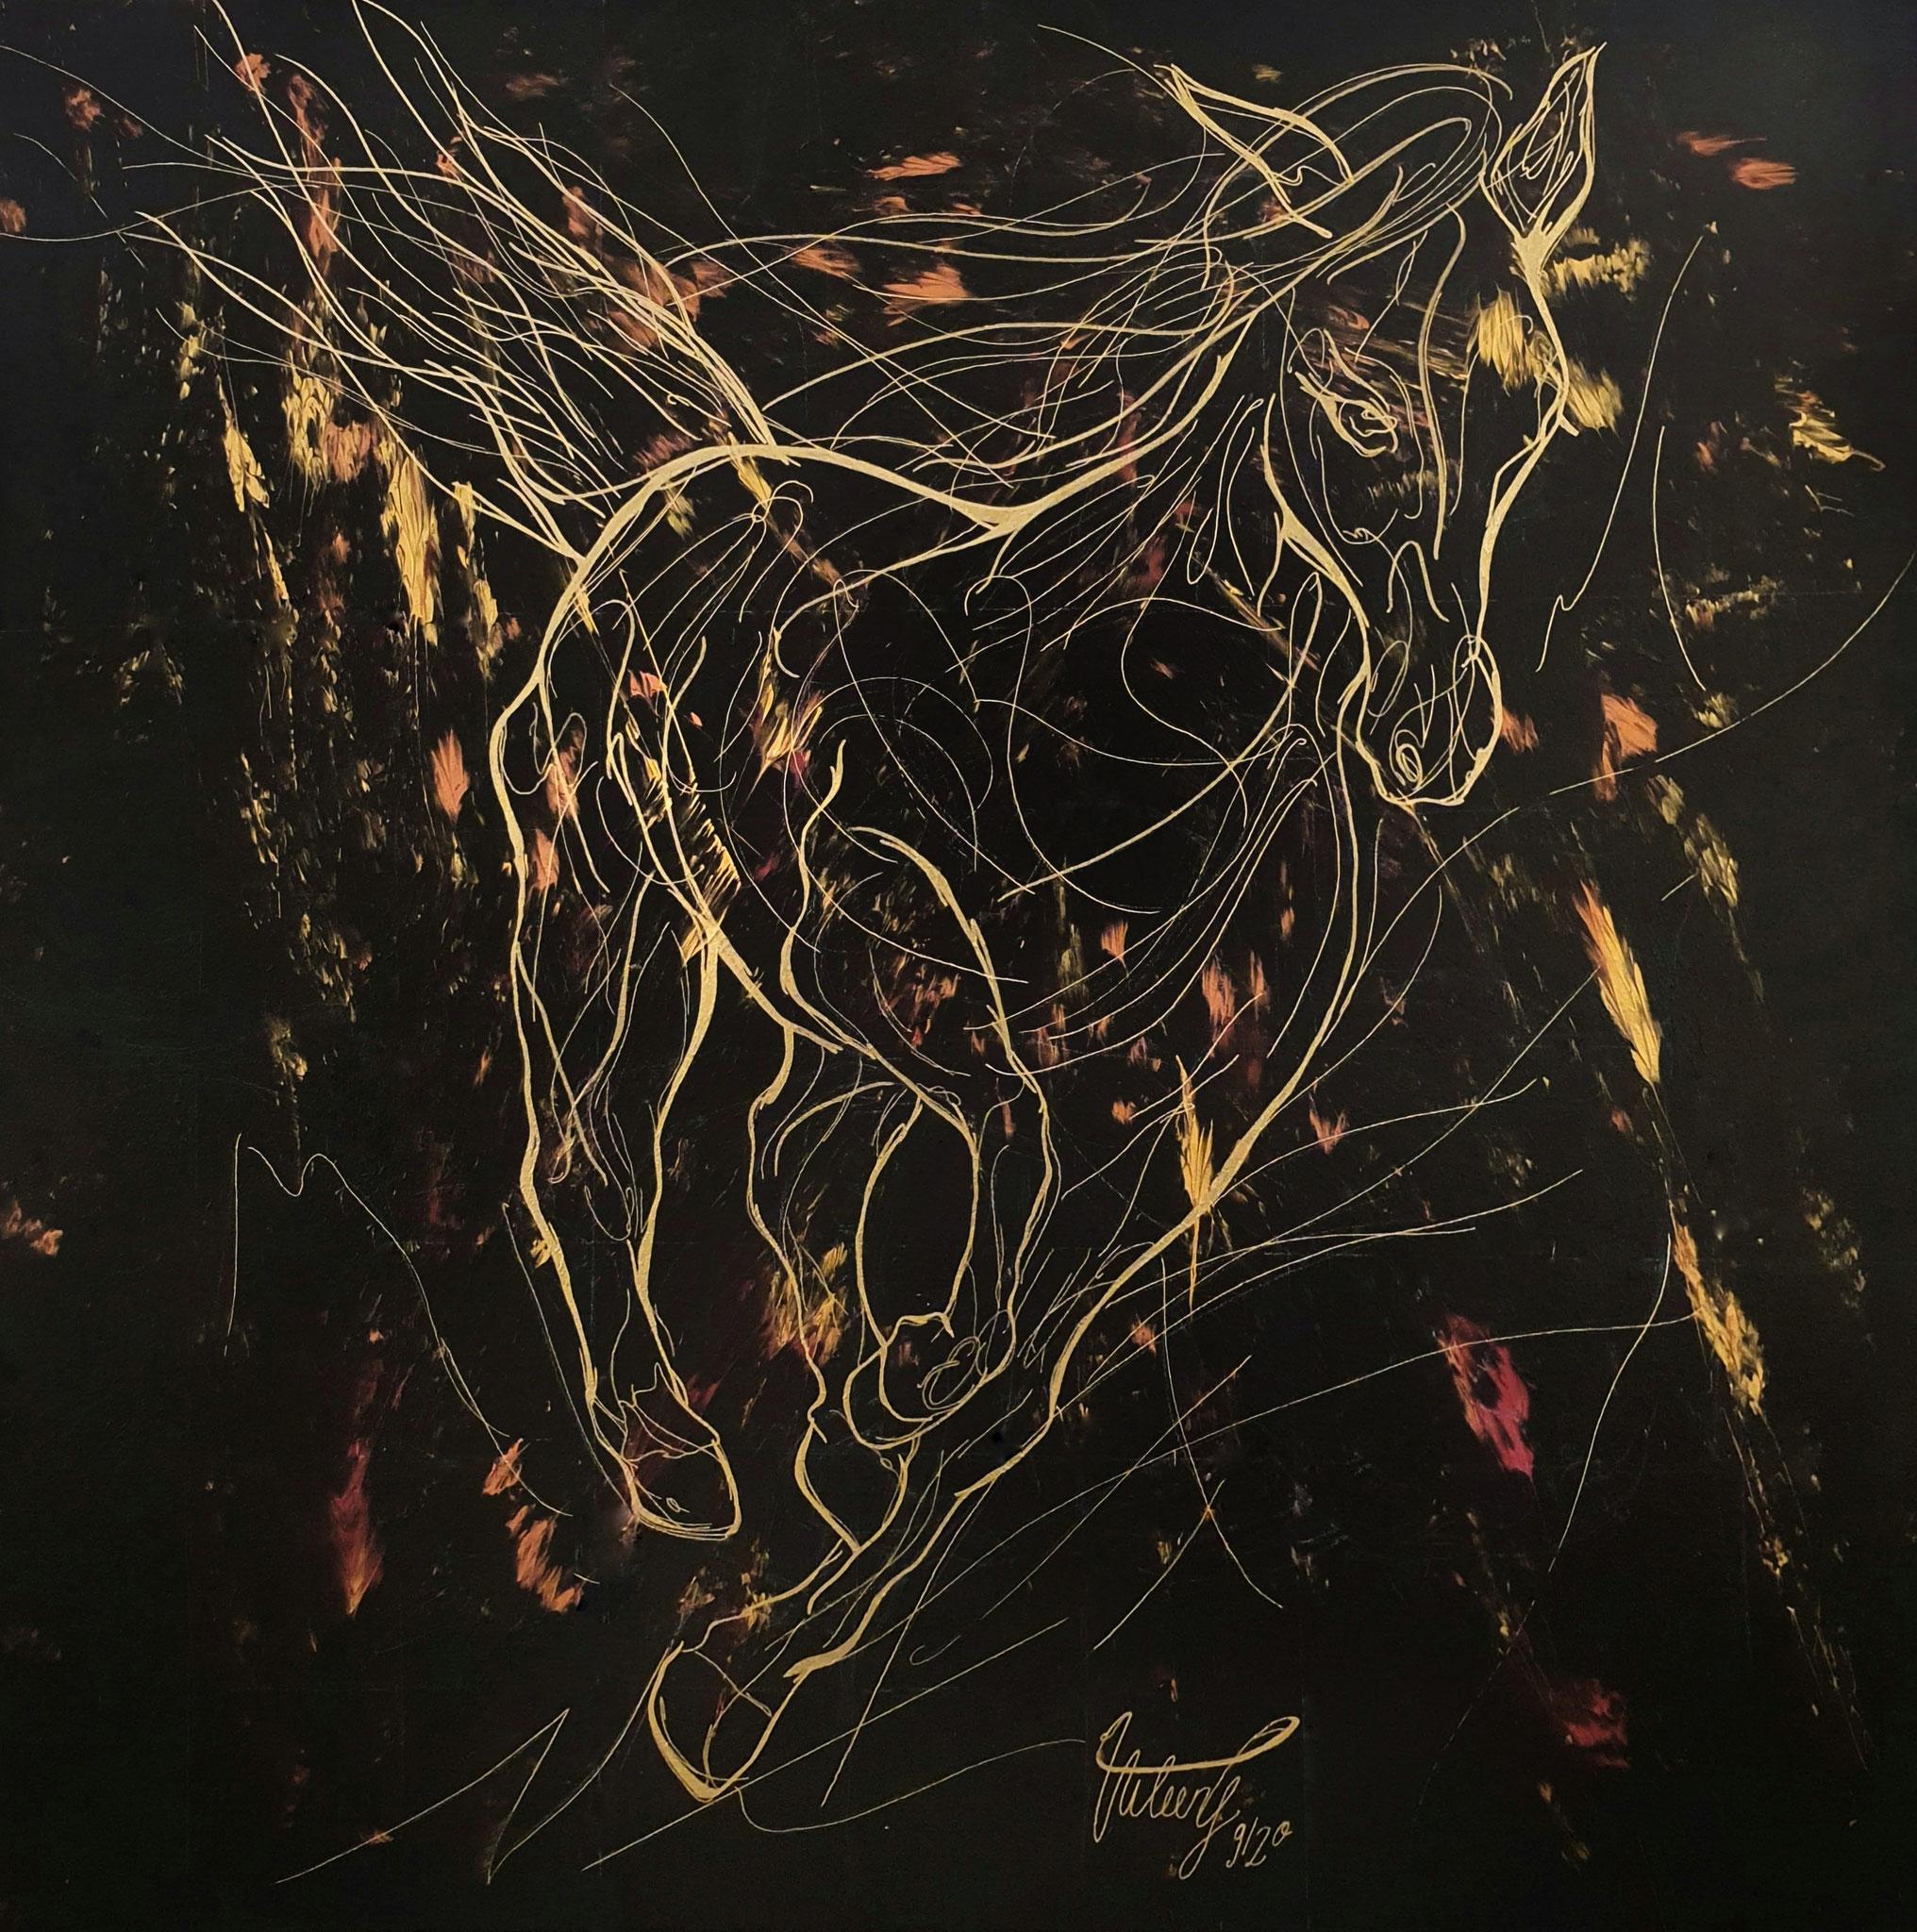 wild horse, 100x100cm, 2020, Acryl auf Leinwand